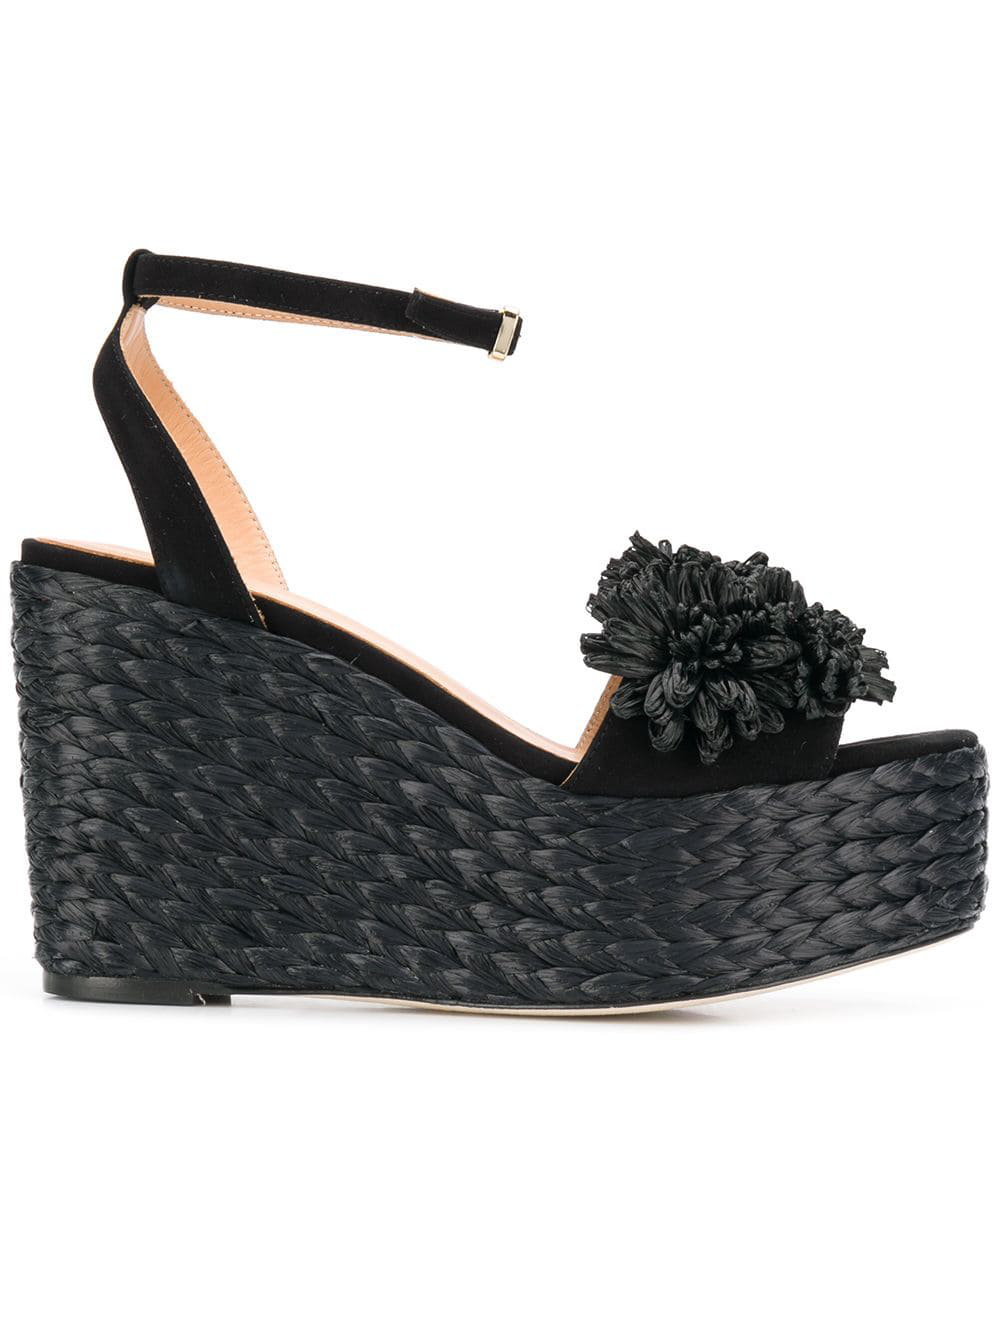 0e0f23bbd8b Paloma BarcelÓ Armele Kid Platform Sandals - Black